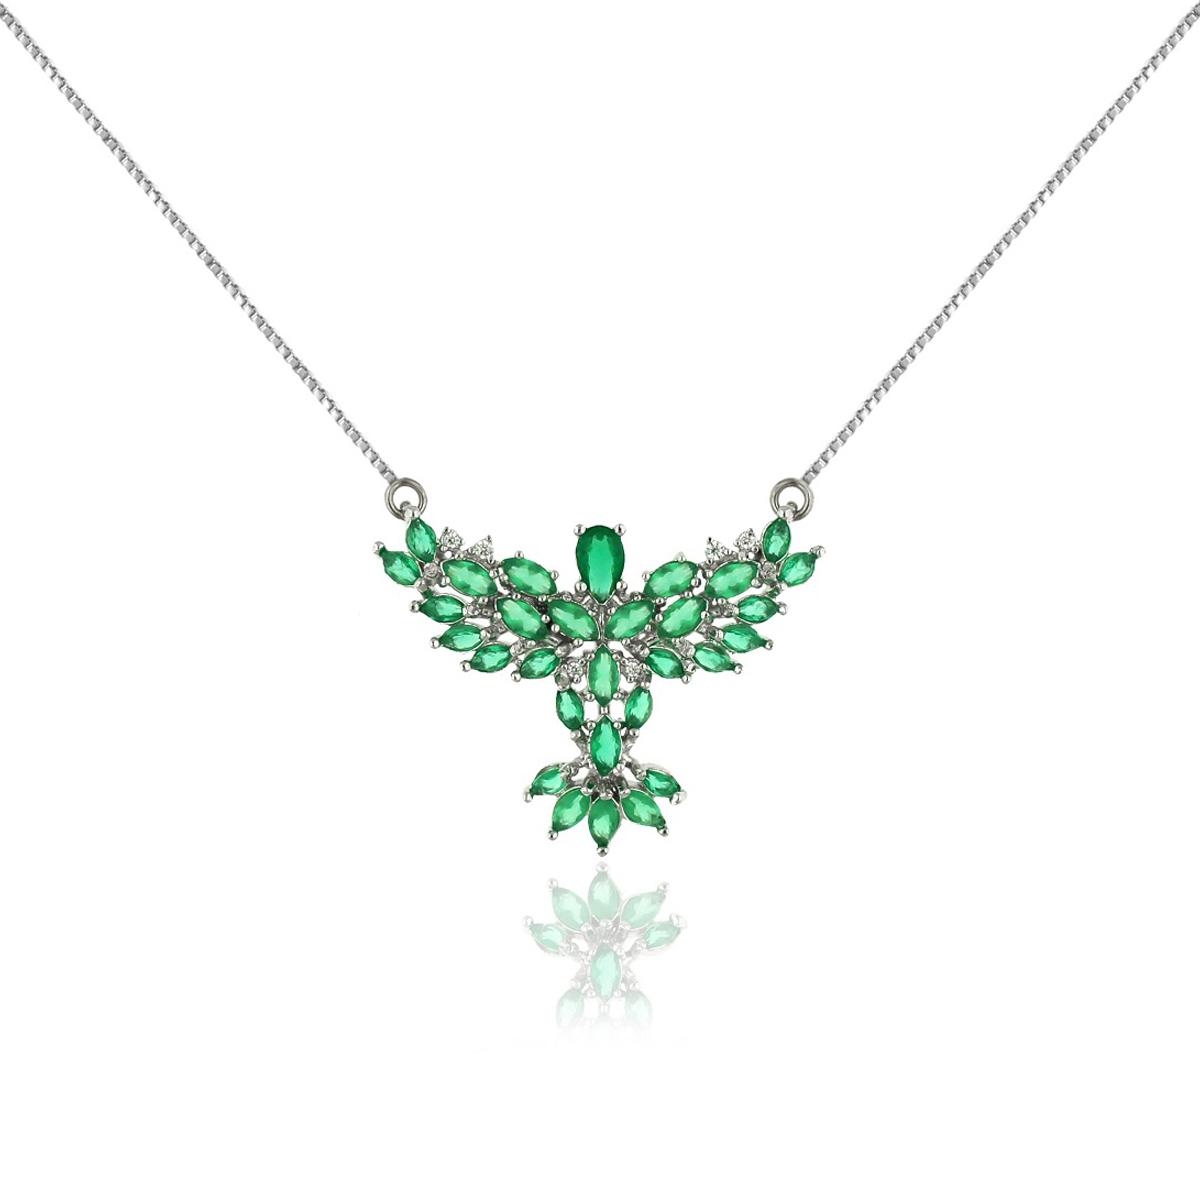 Colar Pingente Espírito Santo Semijoia em Ródio Branco com Cristal Esmeralda e Micro Zircônia Branca  - Soloyou